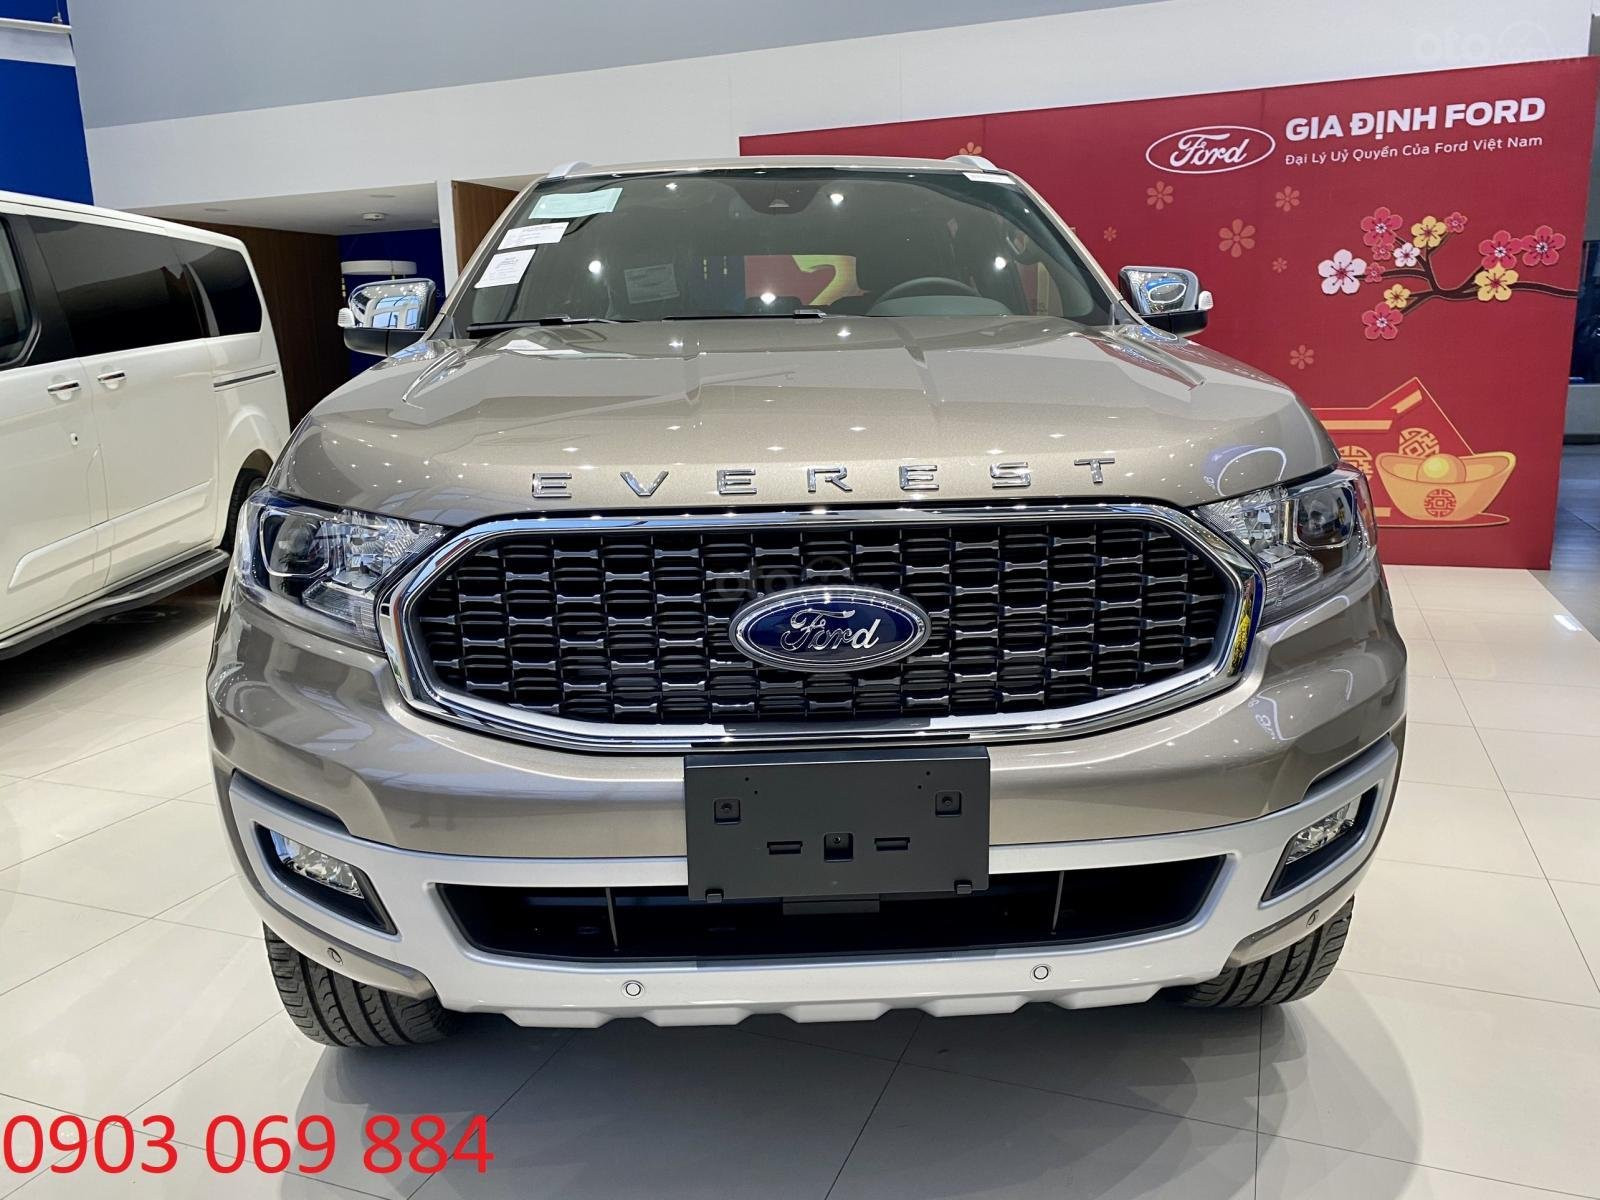 Ford Everest Titanium 2.0 AT 4x2 mới 2021 (1)